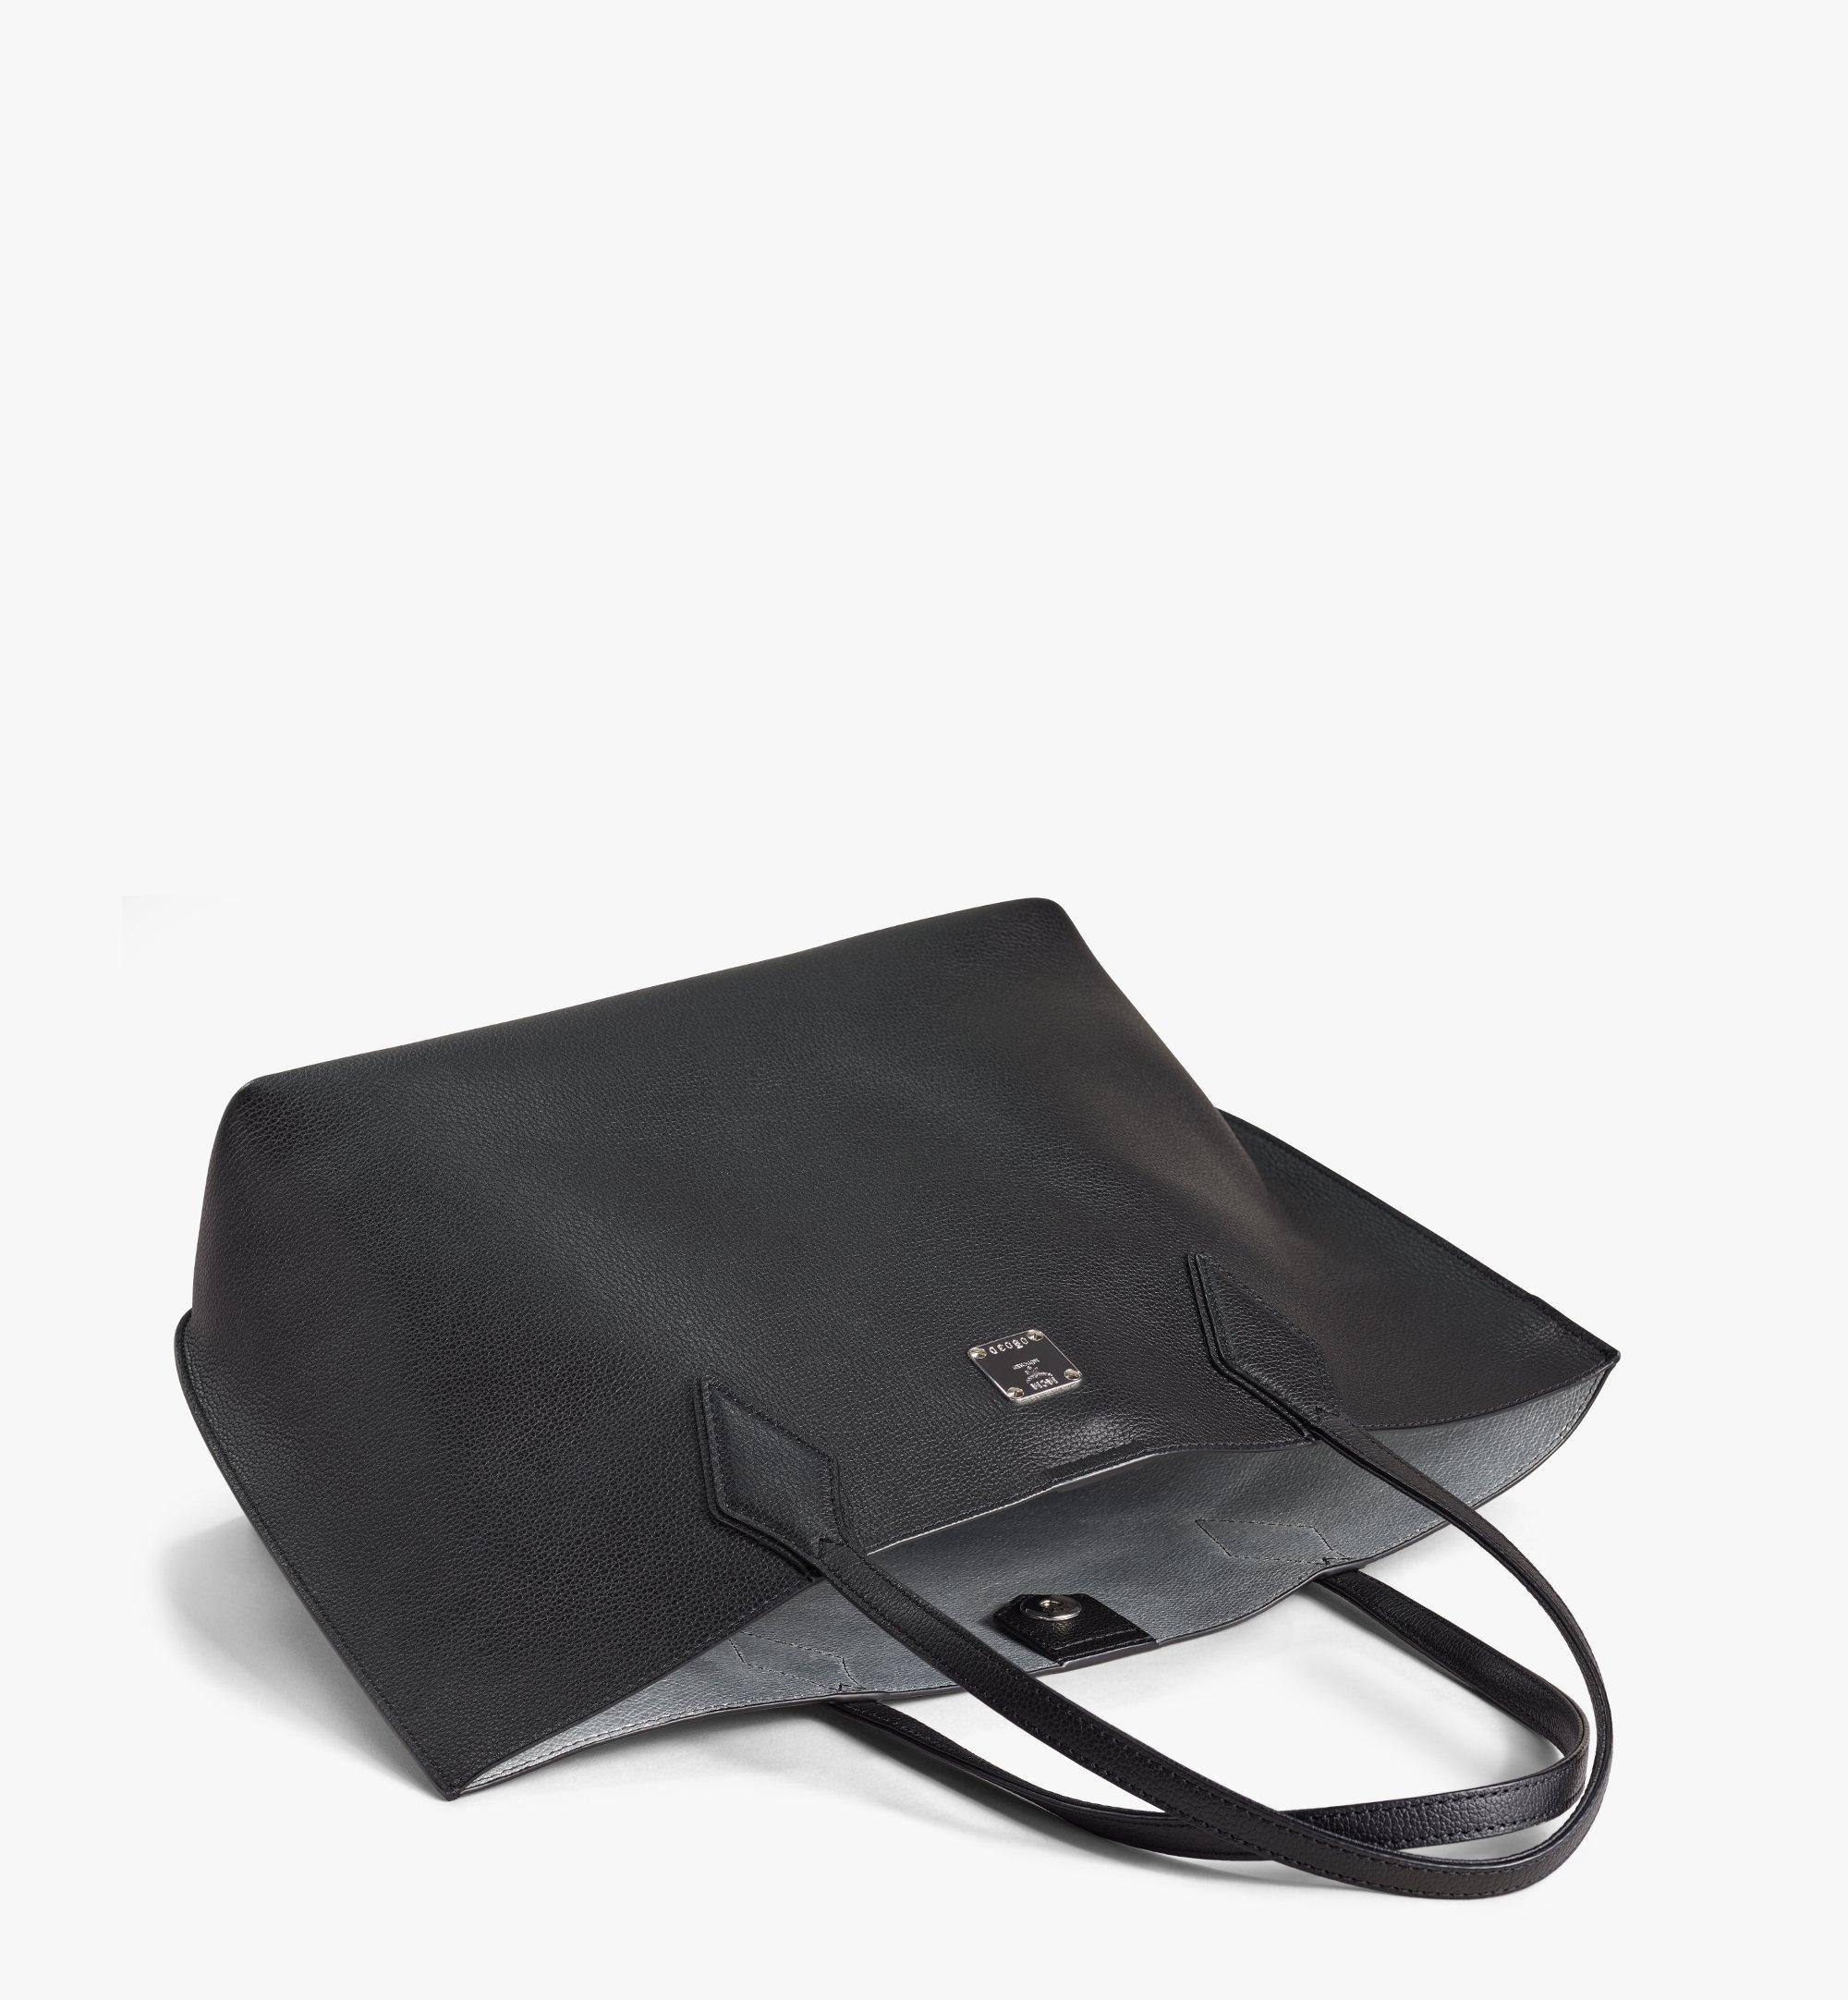 MCM Yris Tani 皮革購物袋 Black MWPAAYS01BK001 更多視圖 2